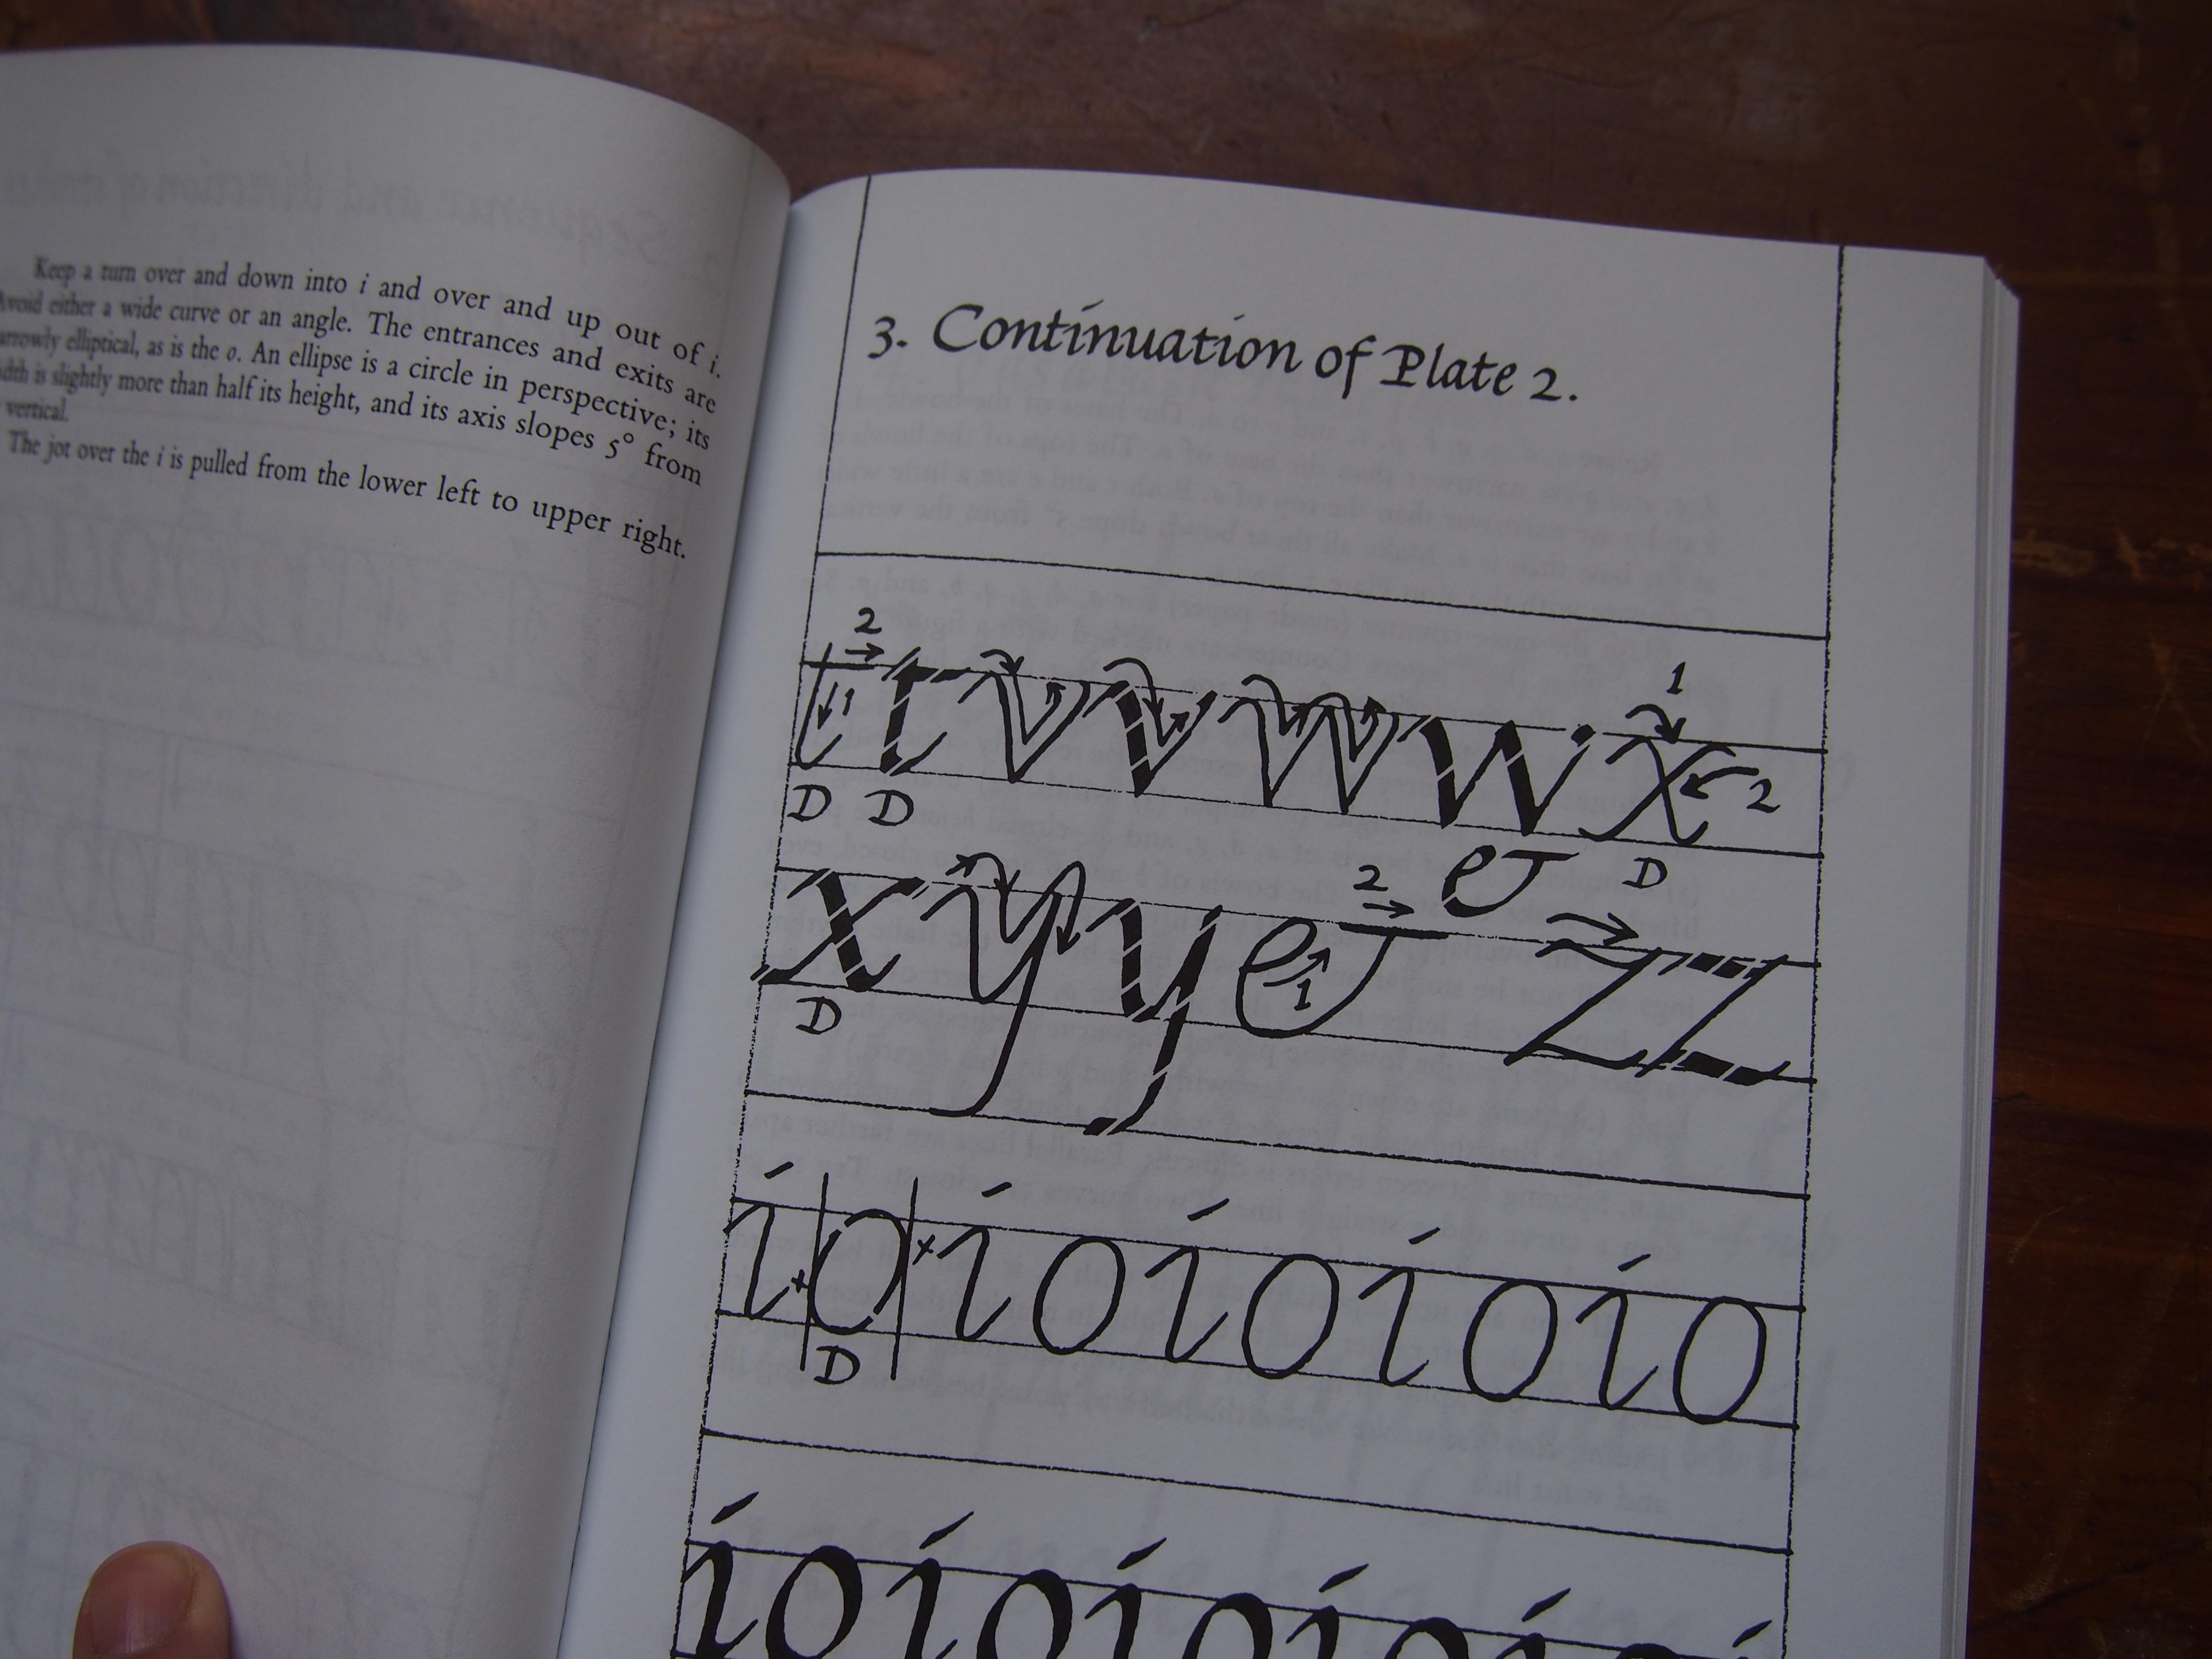 Italic Calligraphy Amp Handwriting Exercises Amp Text By Lloyd J Reynolds